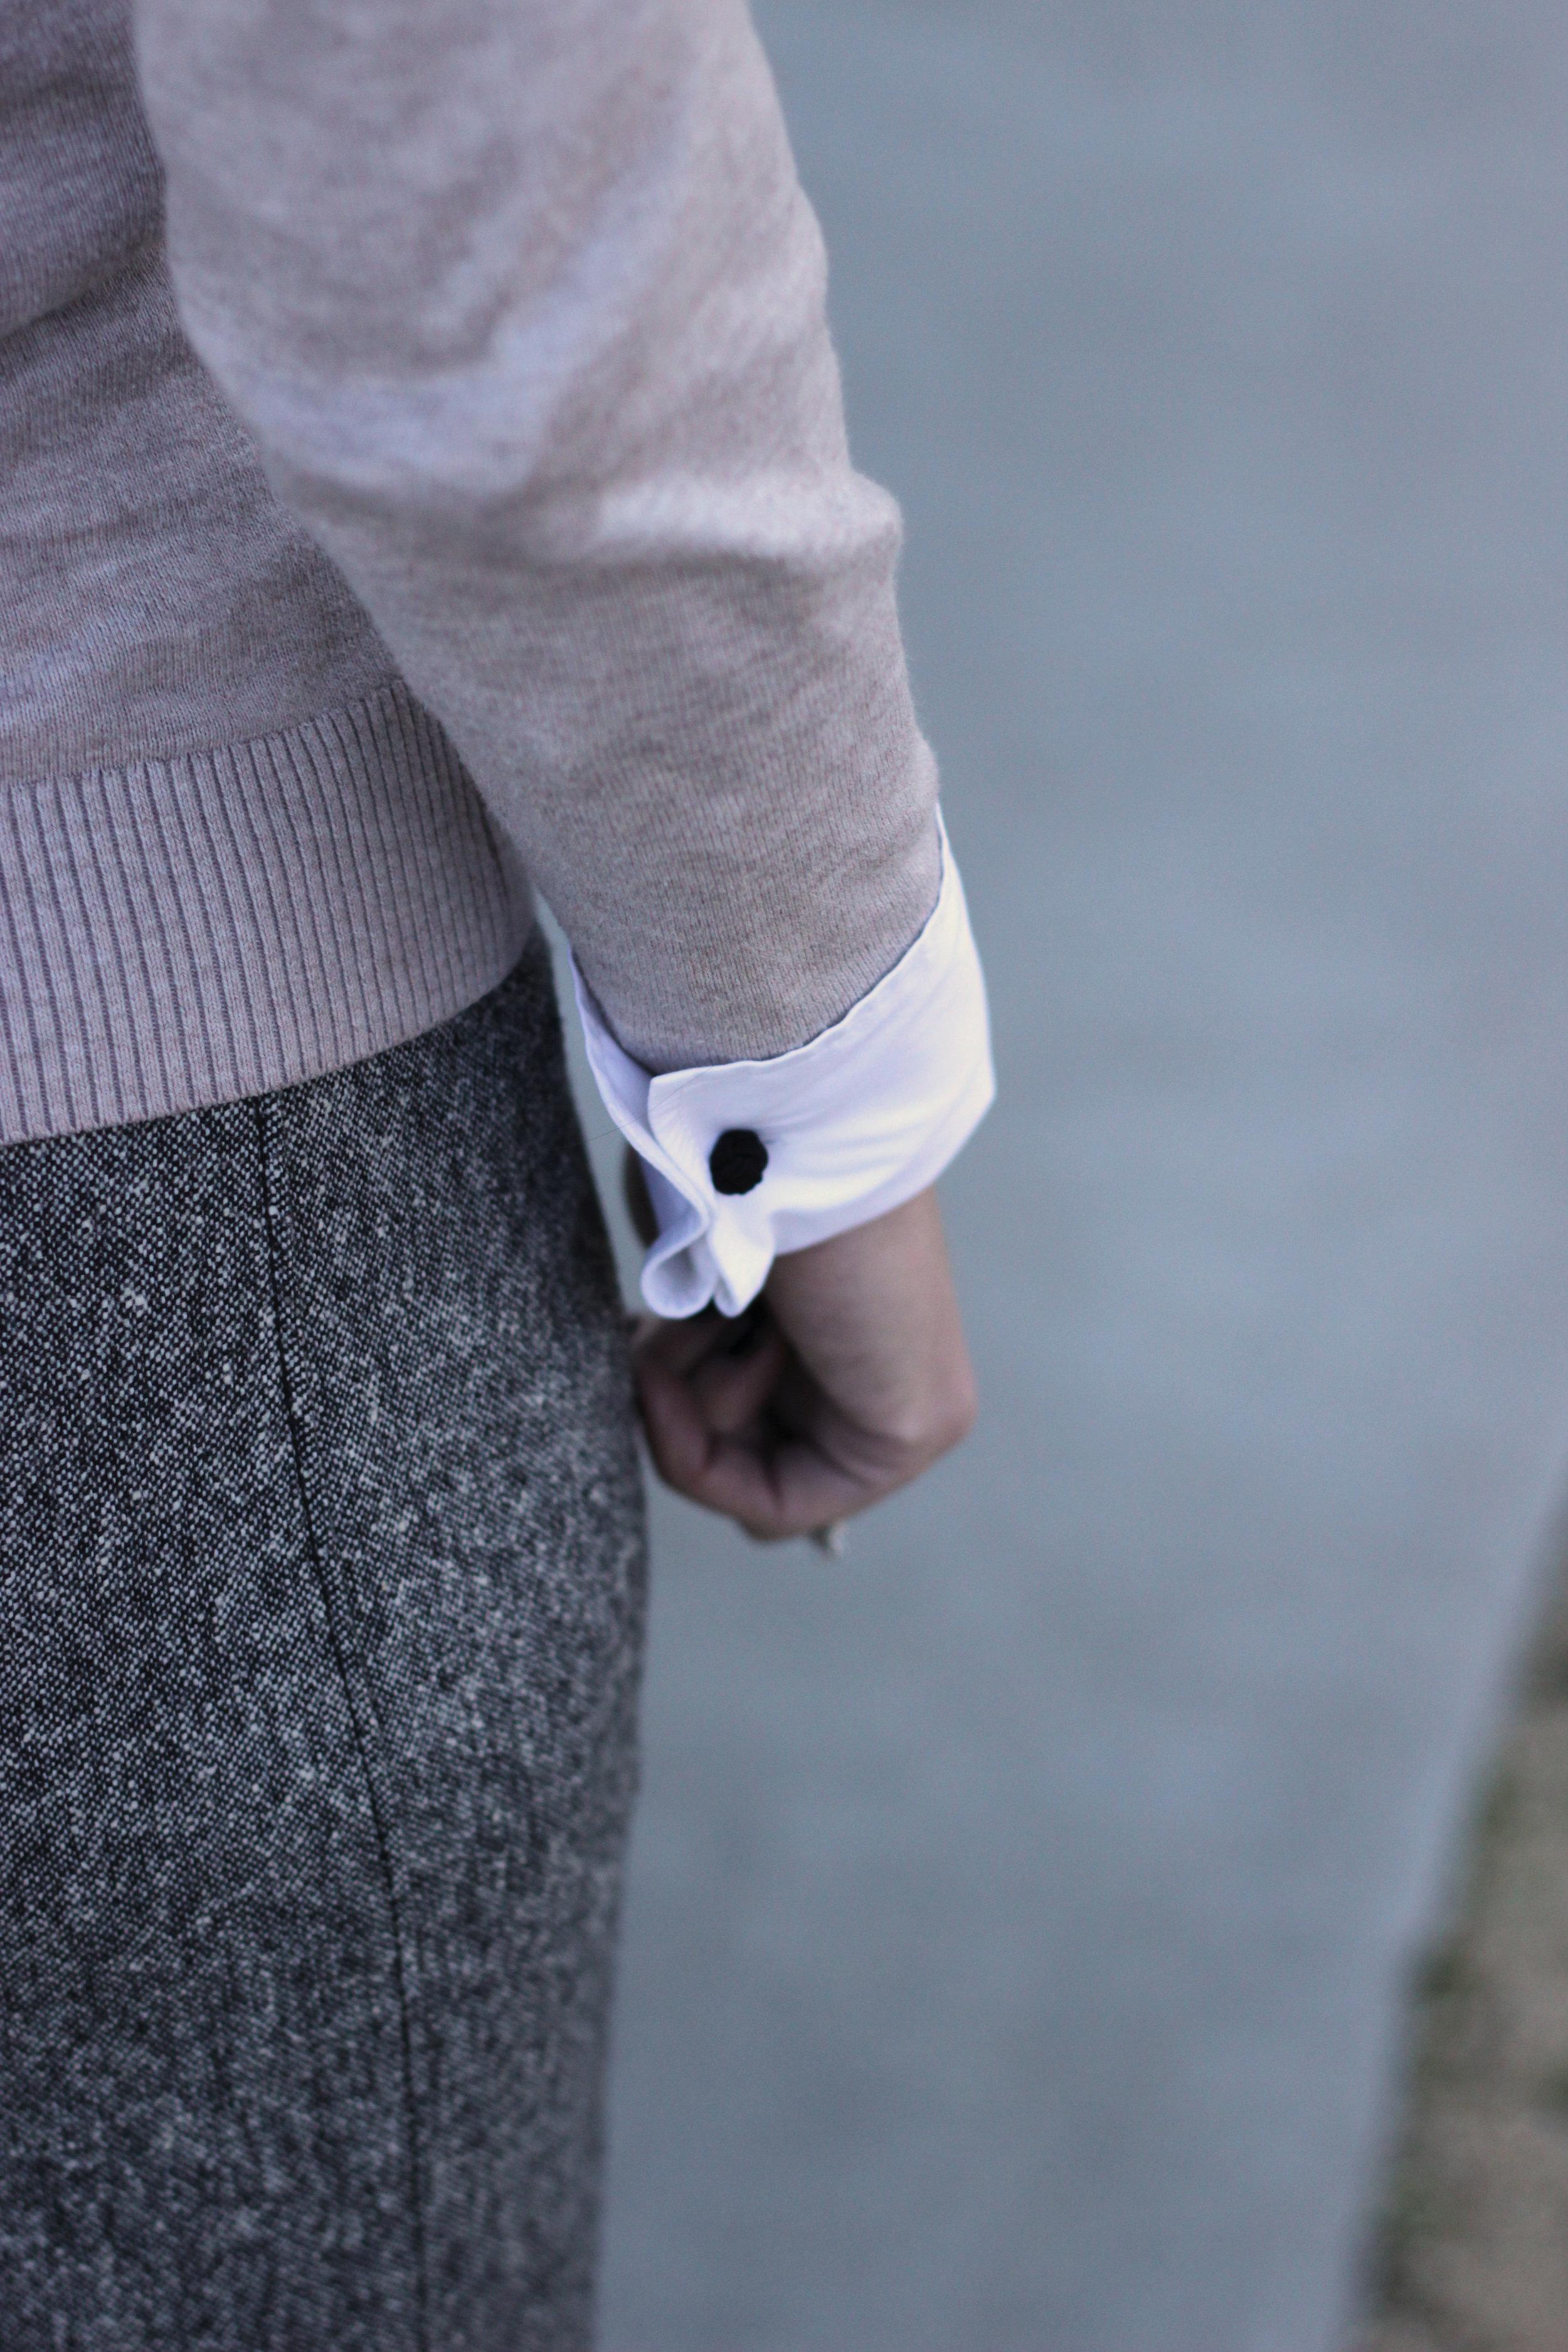 cufflinks-and-sweater.jpg